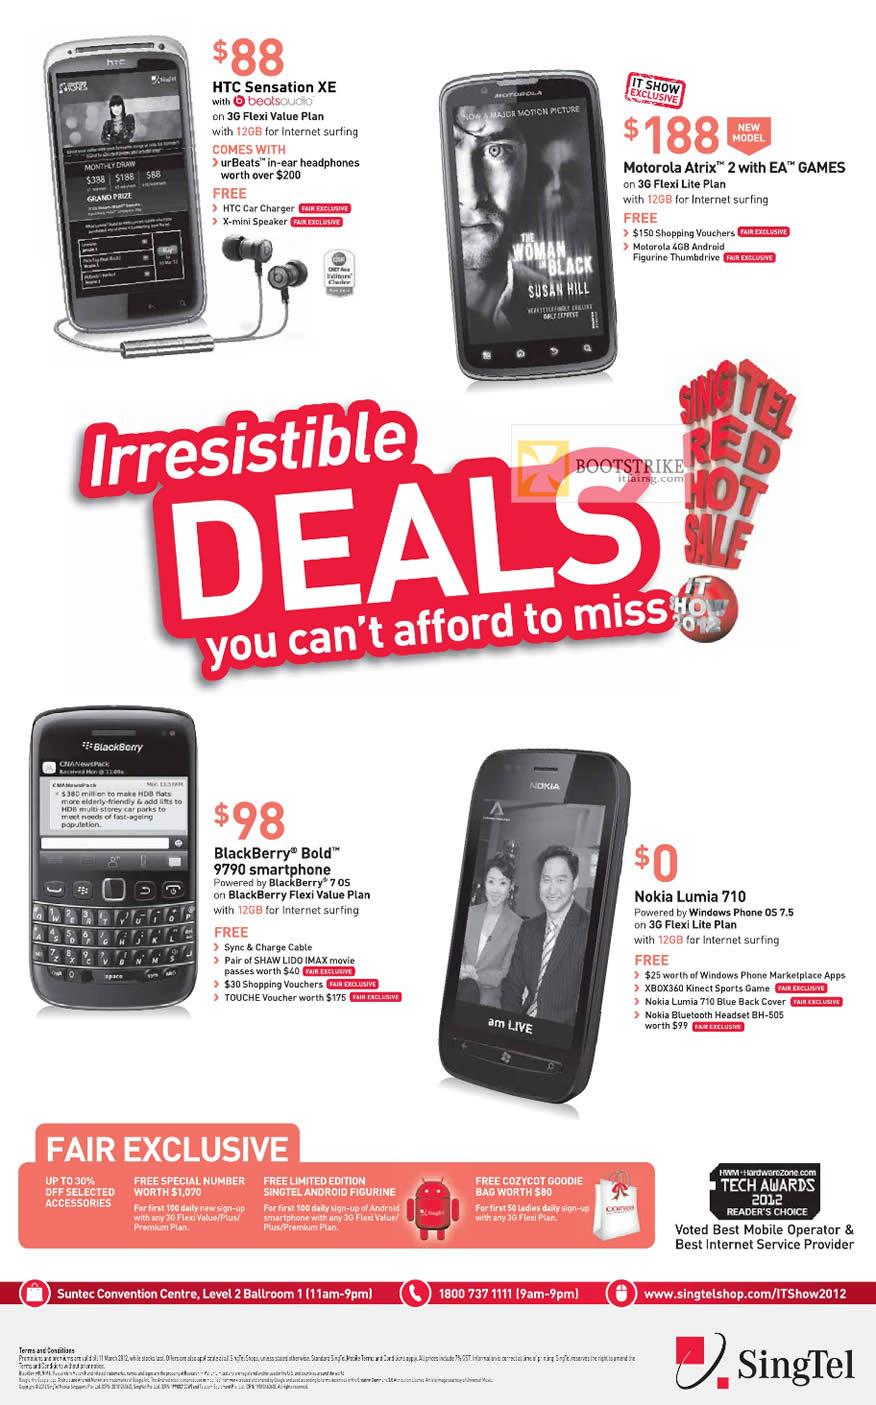 IT SHOW 2012 price list image brochure of Singtel Mobile HTC Sensation XE, Motorola Atrix 2, Blackberry Bold 9790, Nokia Lumia 710